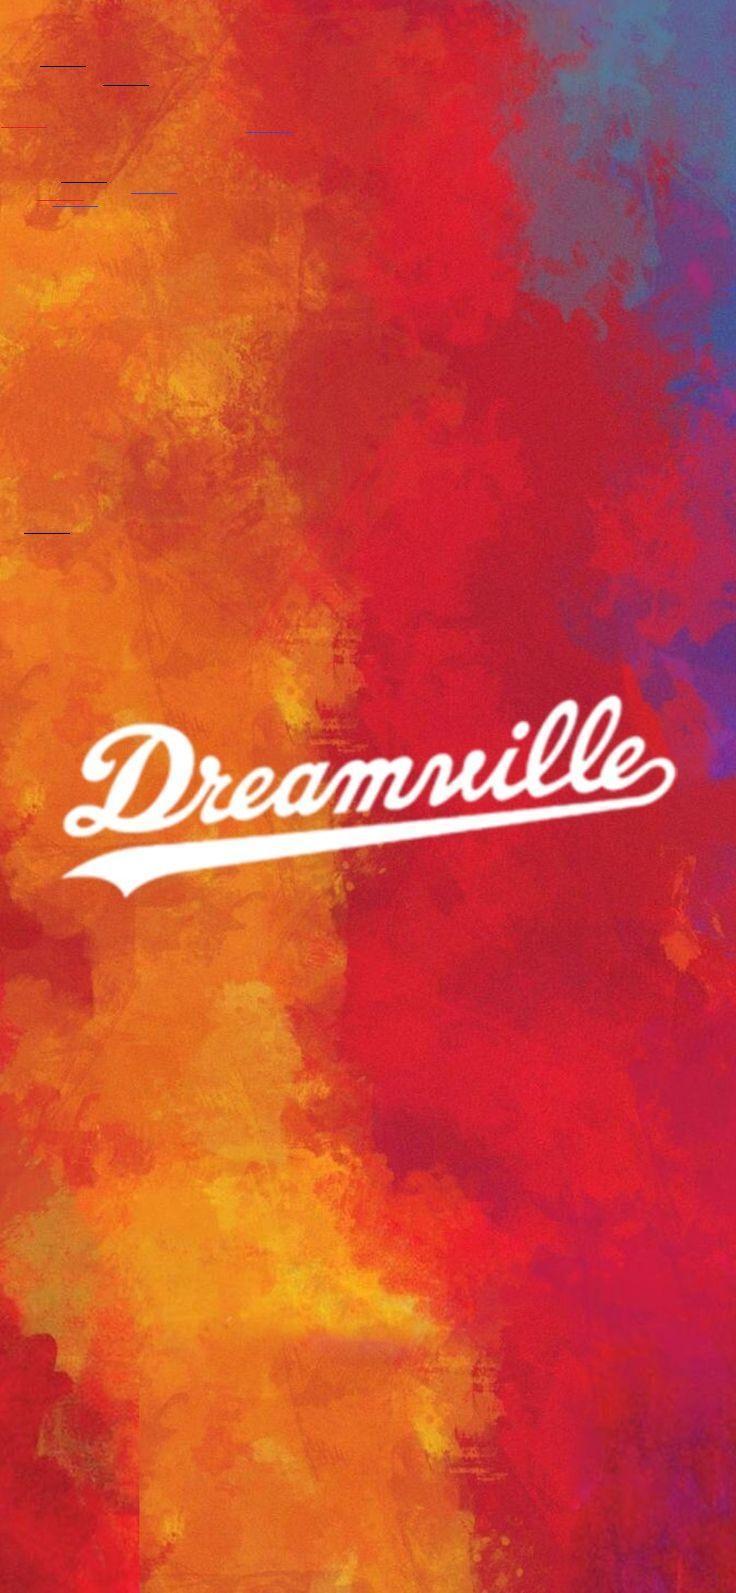 J Cole Dreamville White Phone Wallpaper HD nel 2020 Sfondi